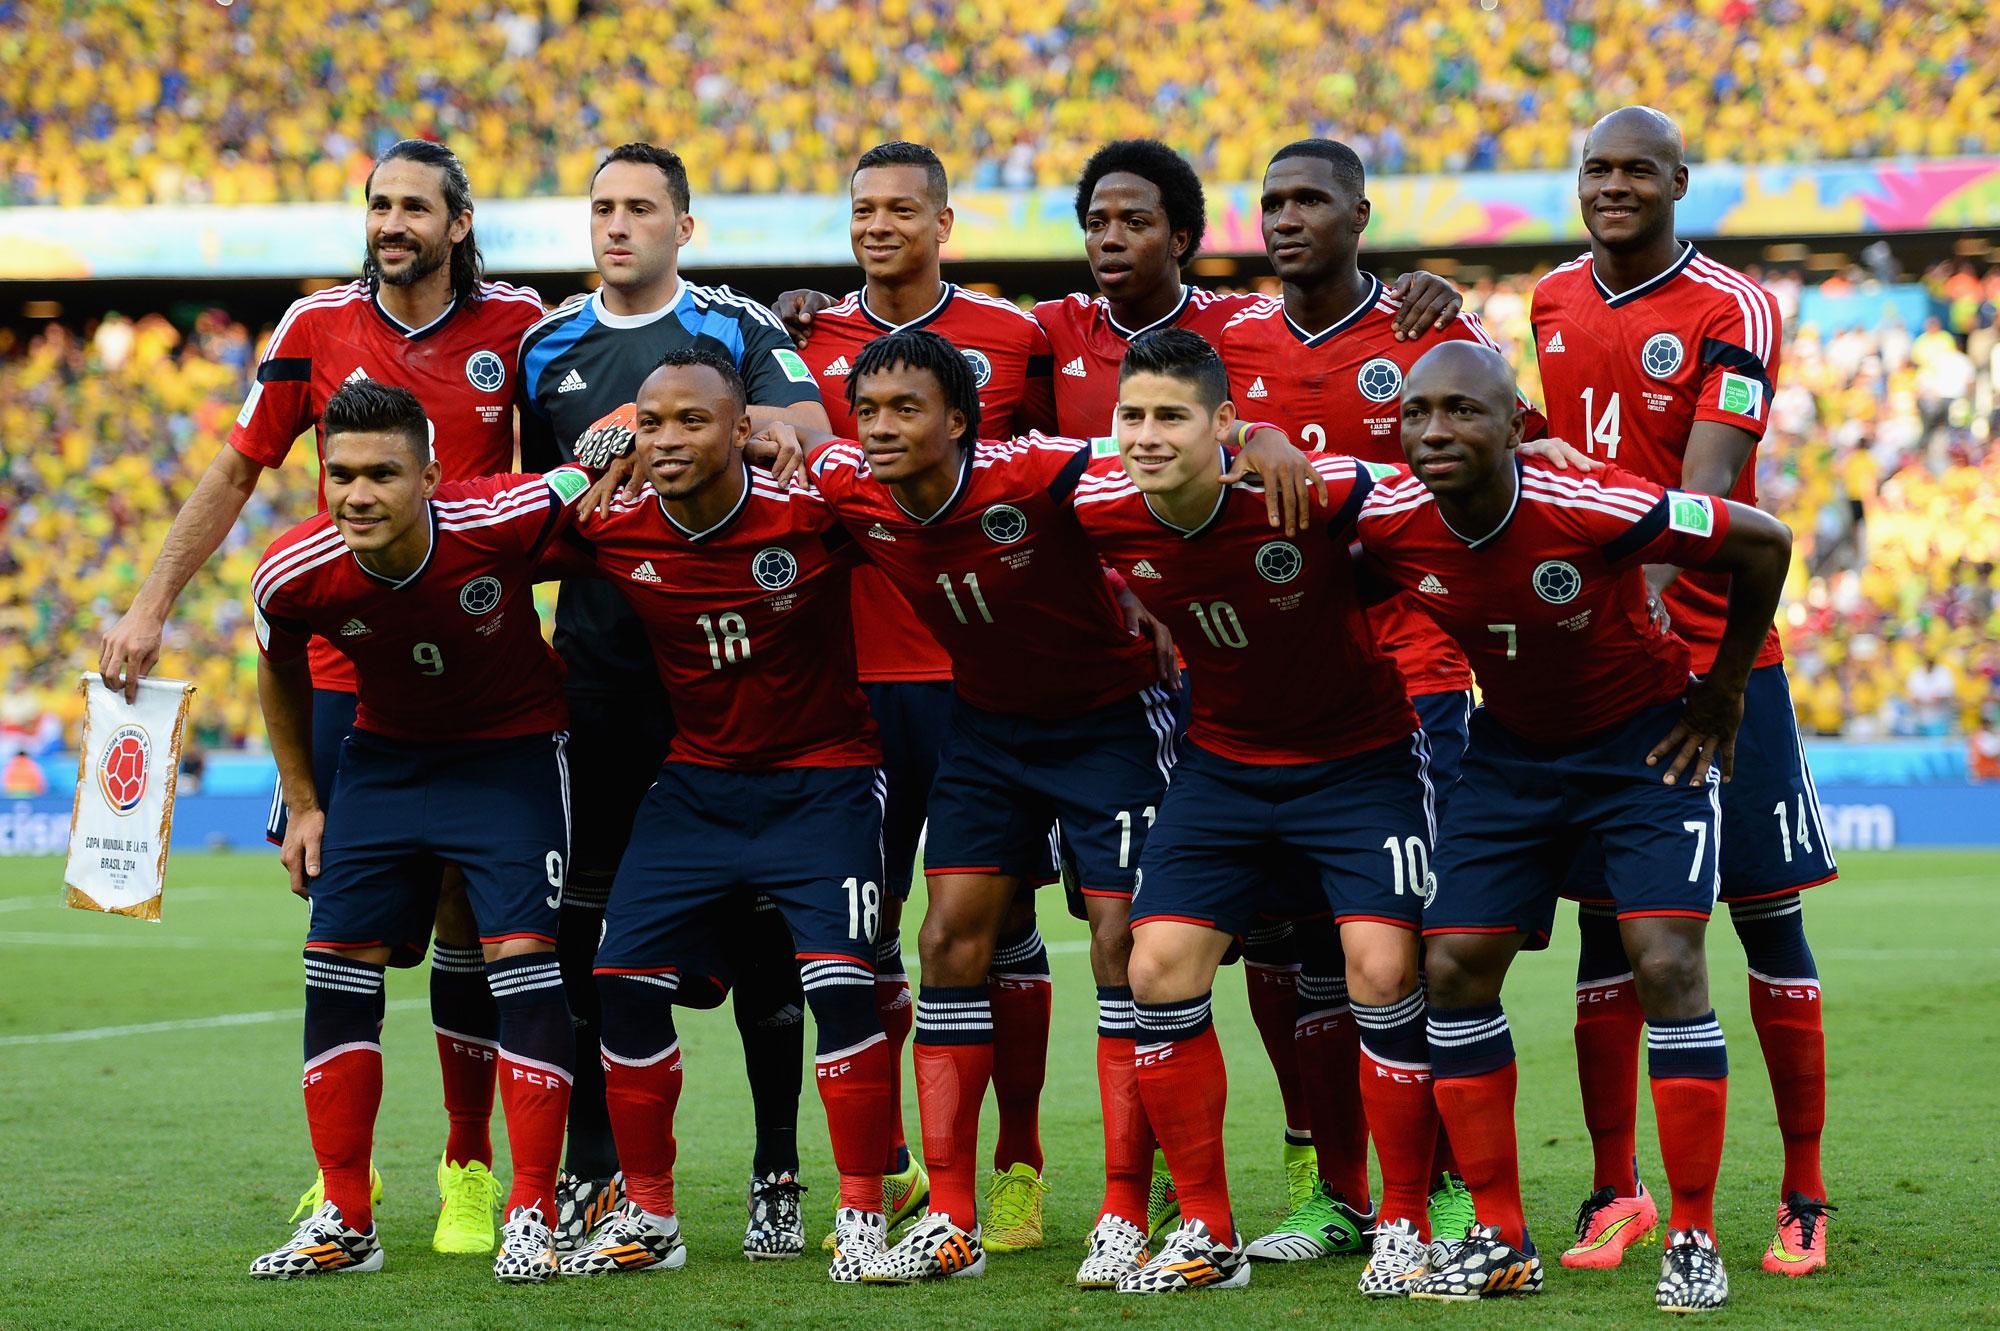 Selección Colombiana 2014